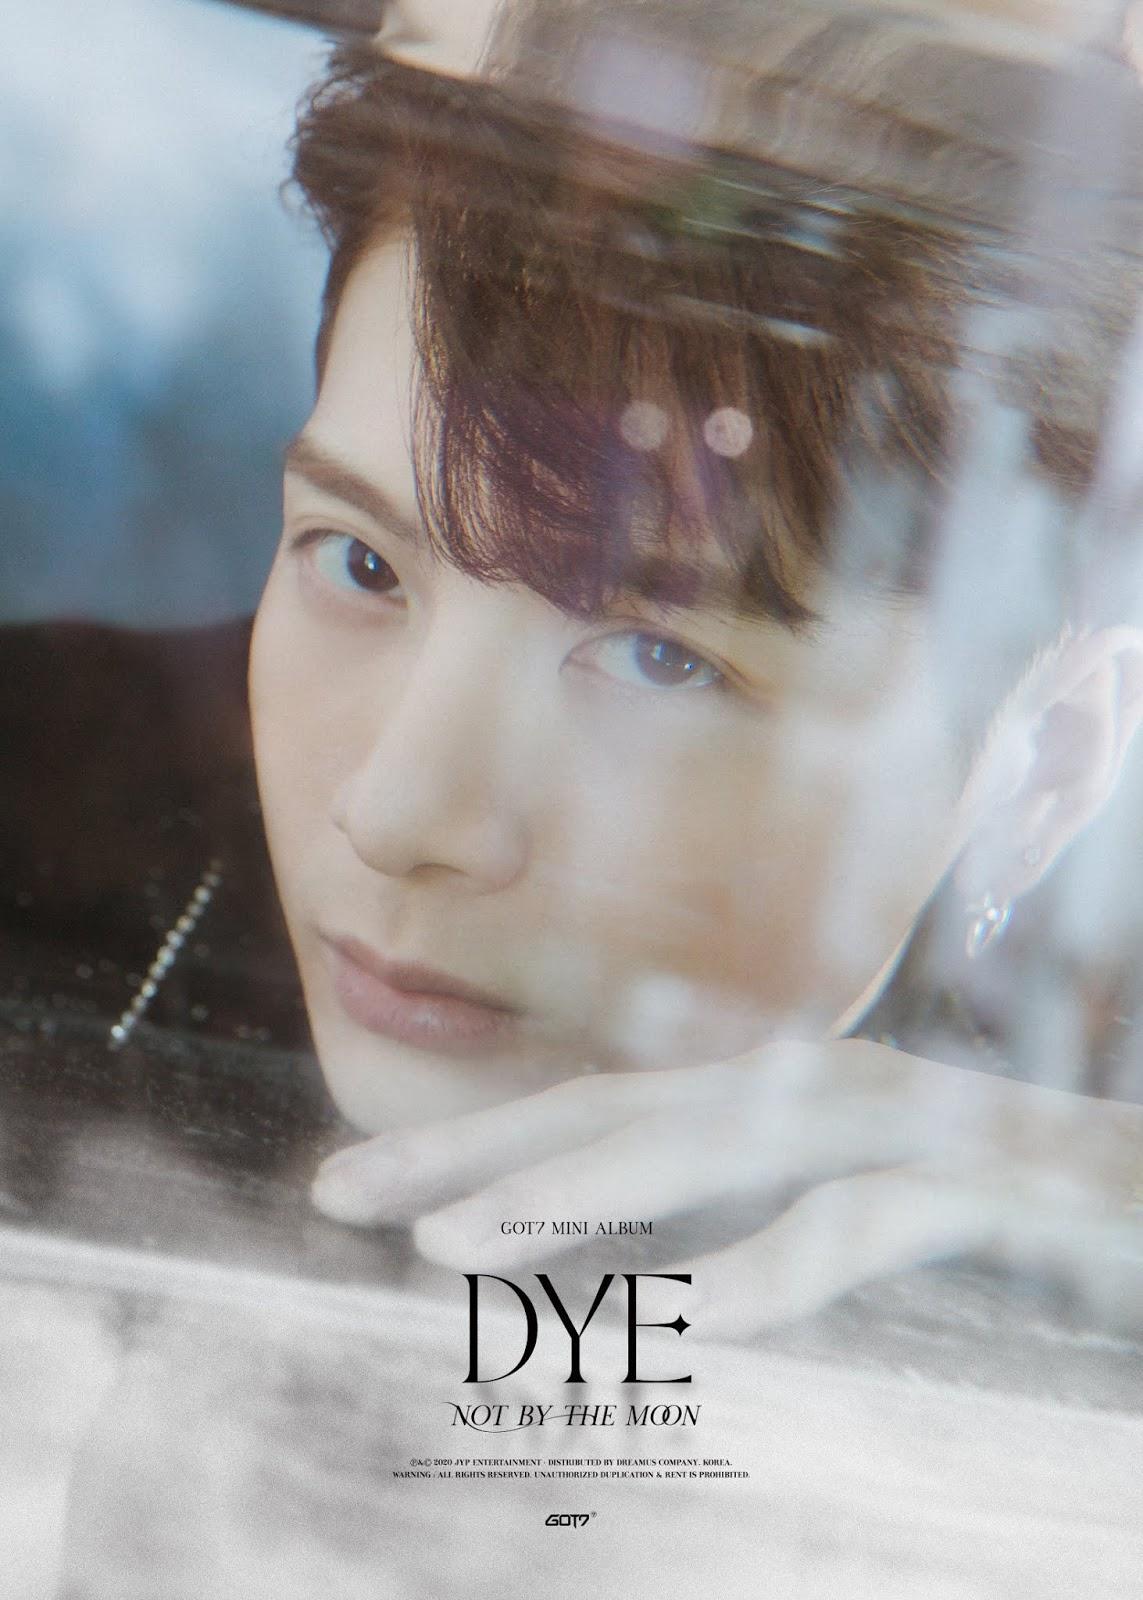 GOT7 DYE Album Photo Collection